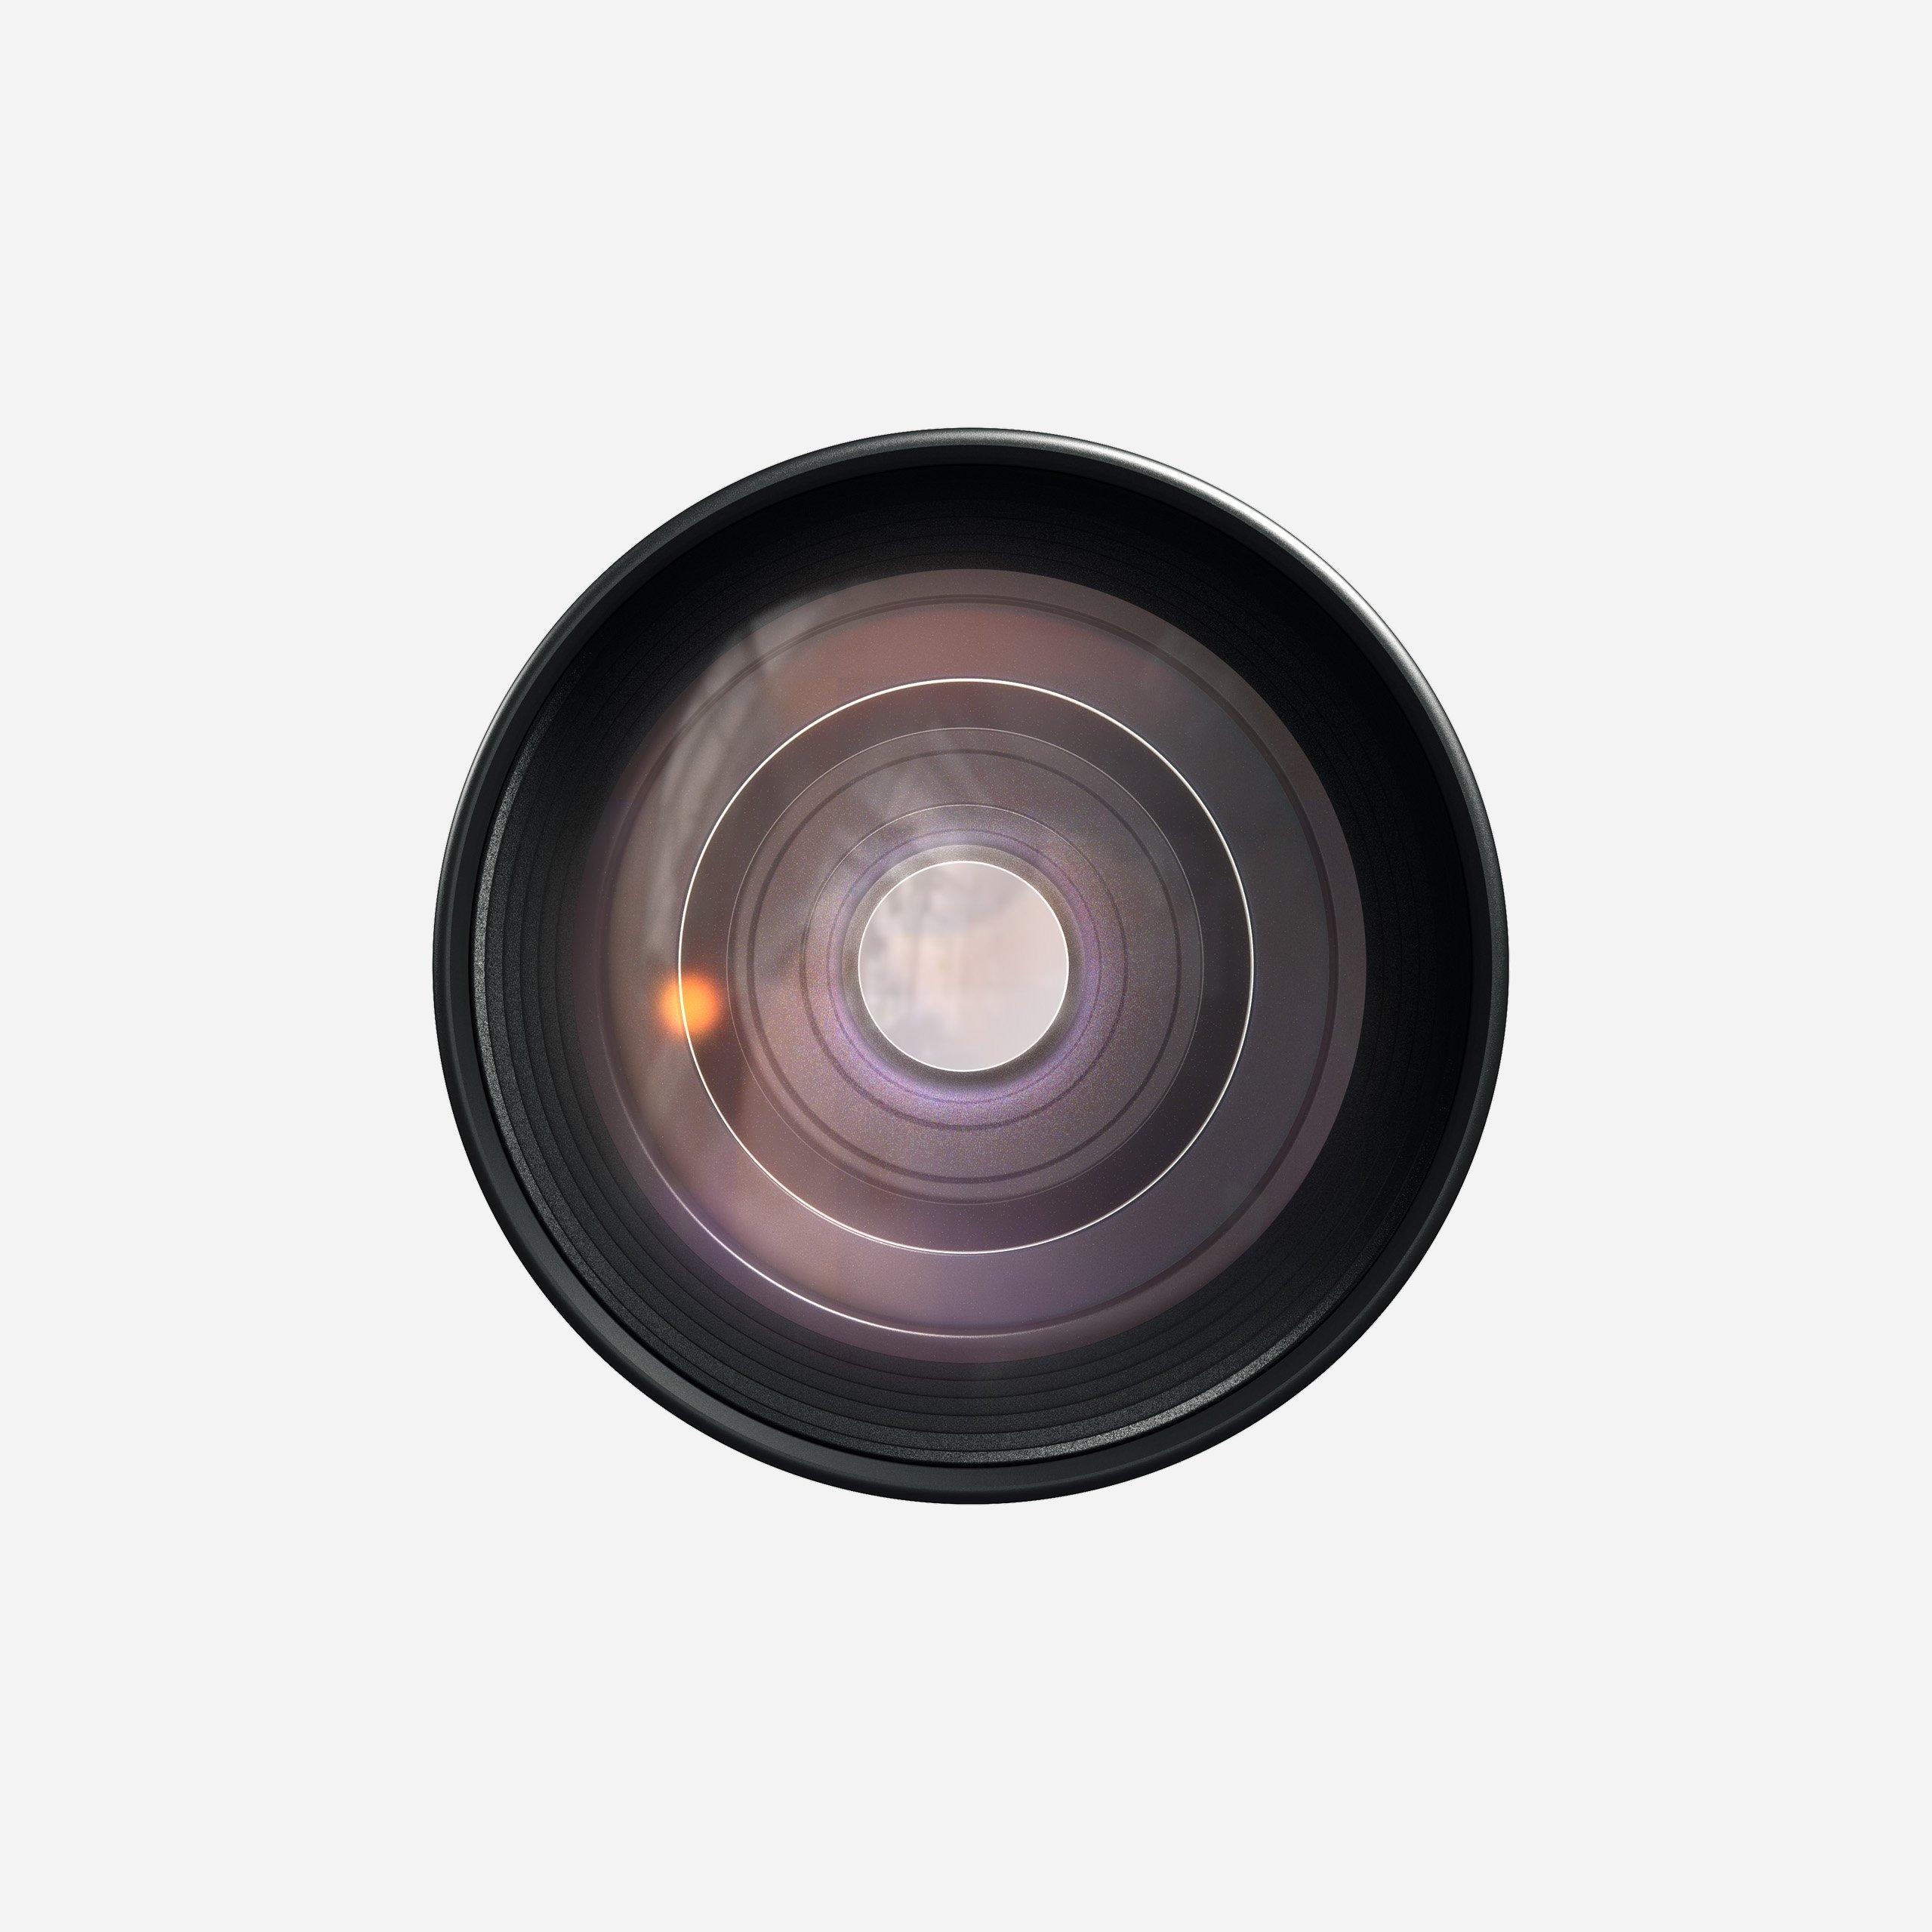 Moment Tele 58mm Lens Front